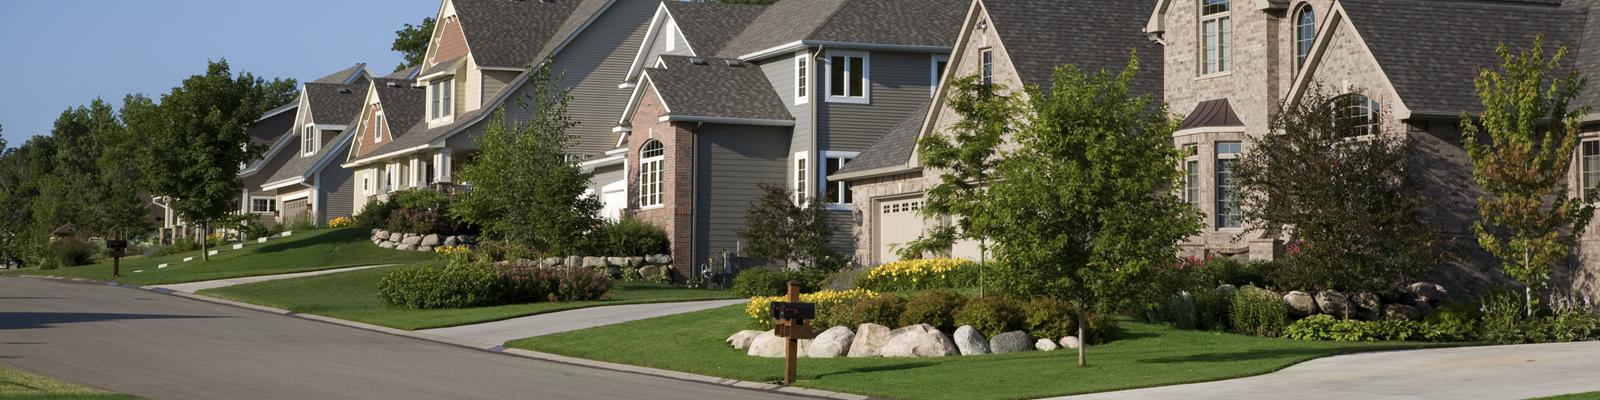 Mississauga Real Estate Homes For Sale